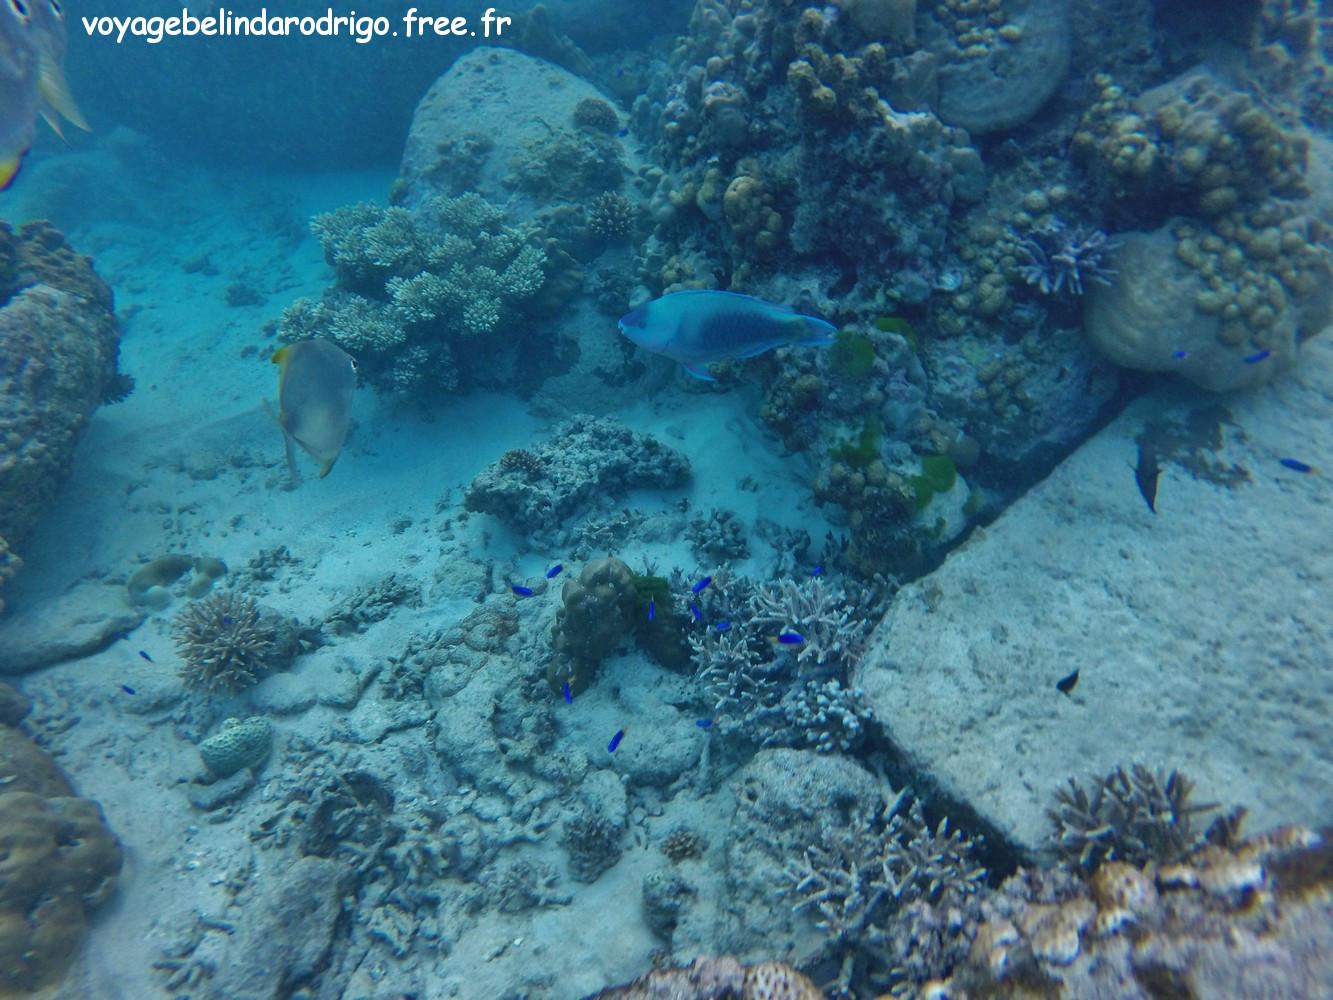 Poisson Perroquet - Snorkeling - Anse Lazio - Praslin